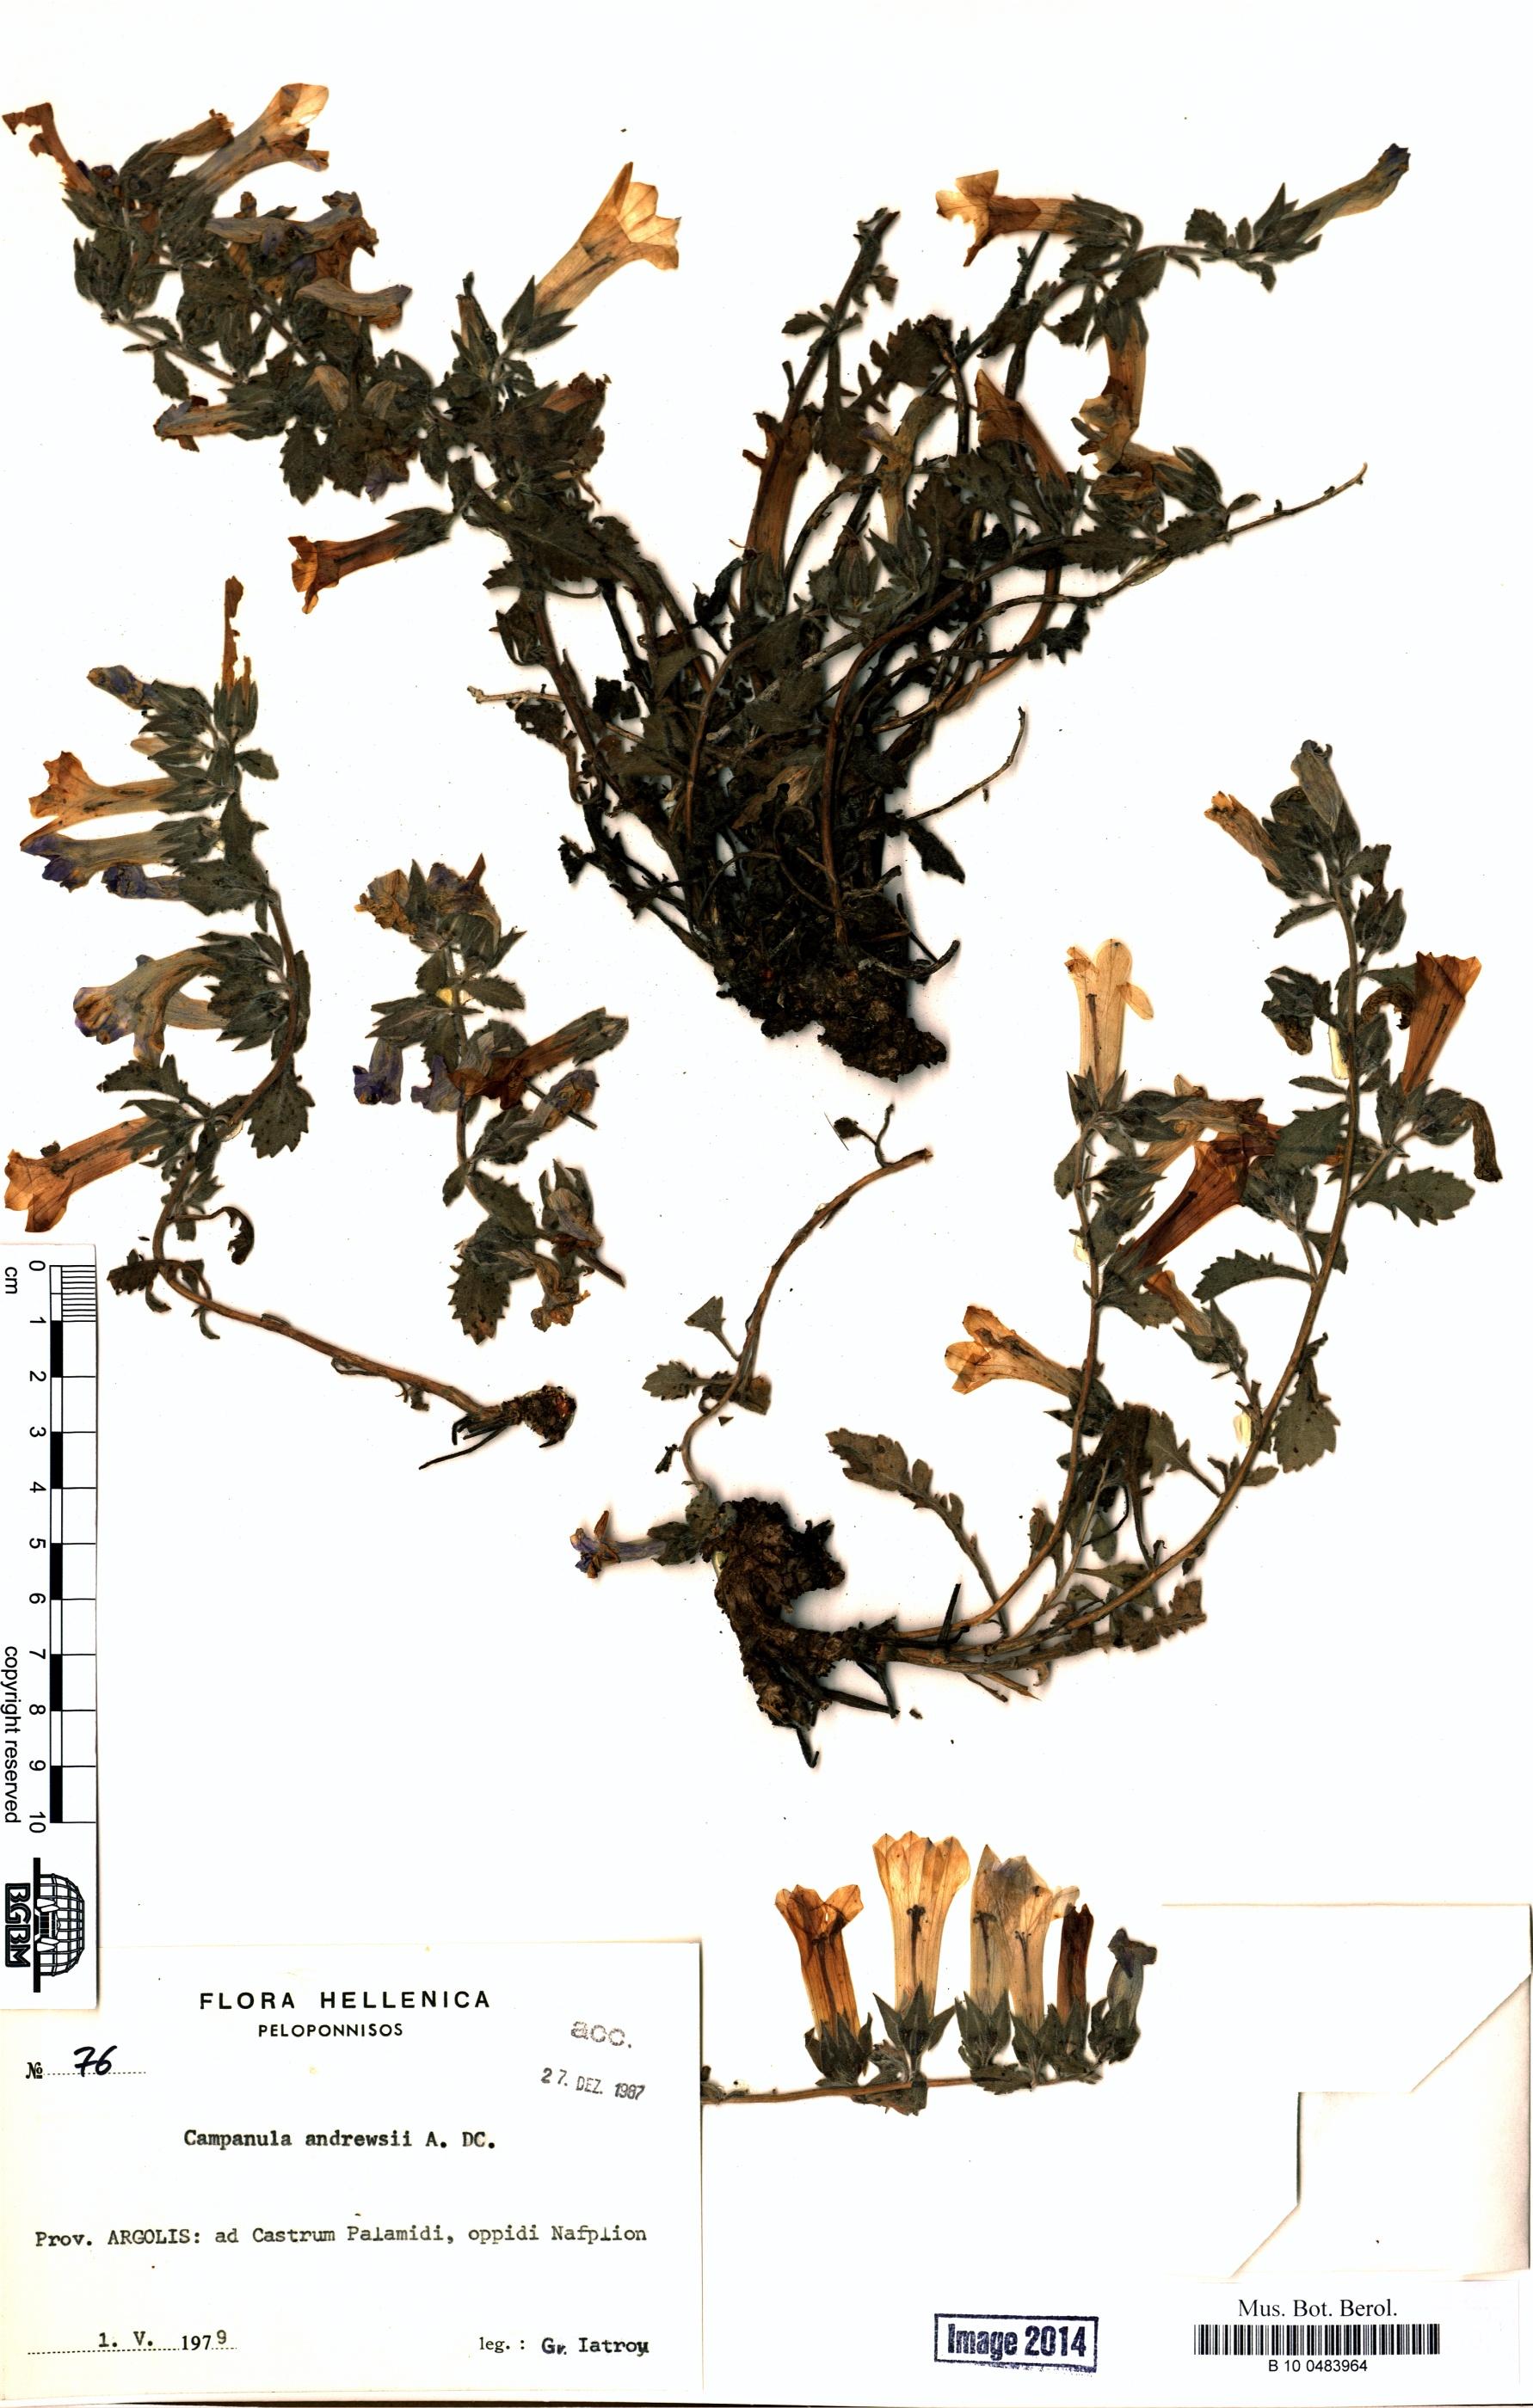 http://ww2.bgbm.org/herbarium/images/B/10/04/83/96/B_10_0483964.jpg